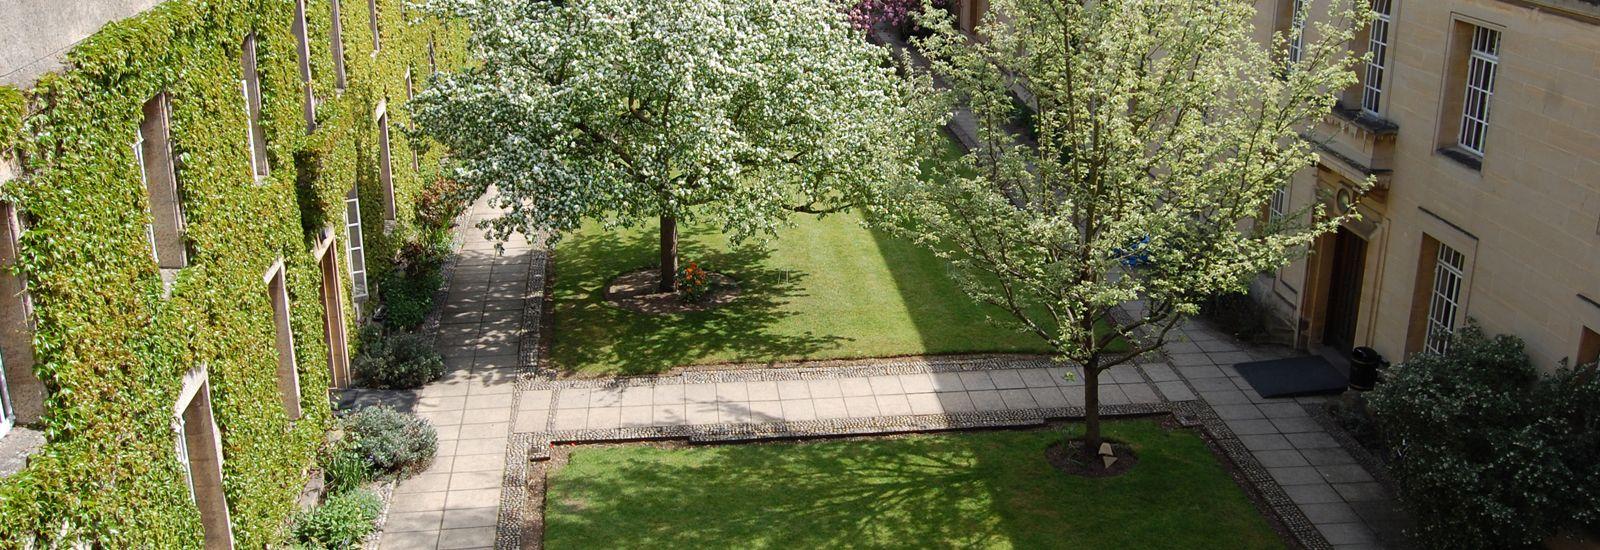 Regent's Park quad